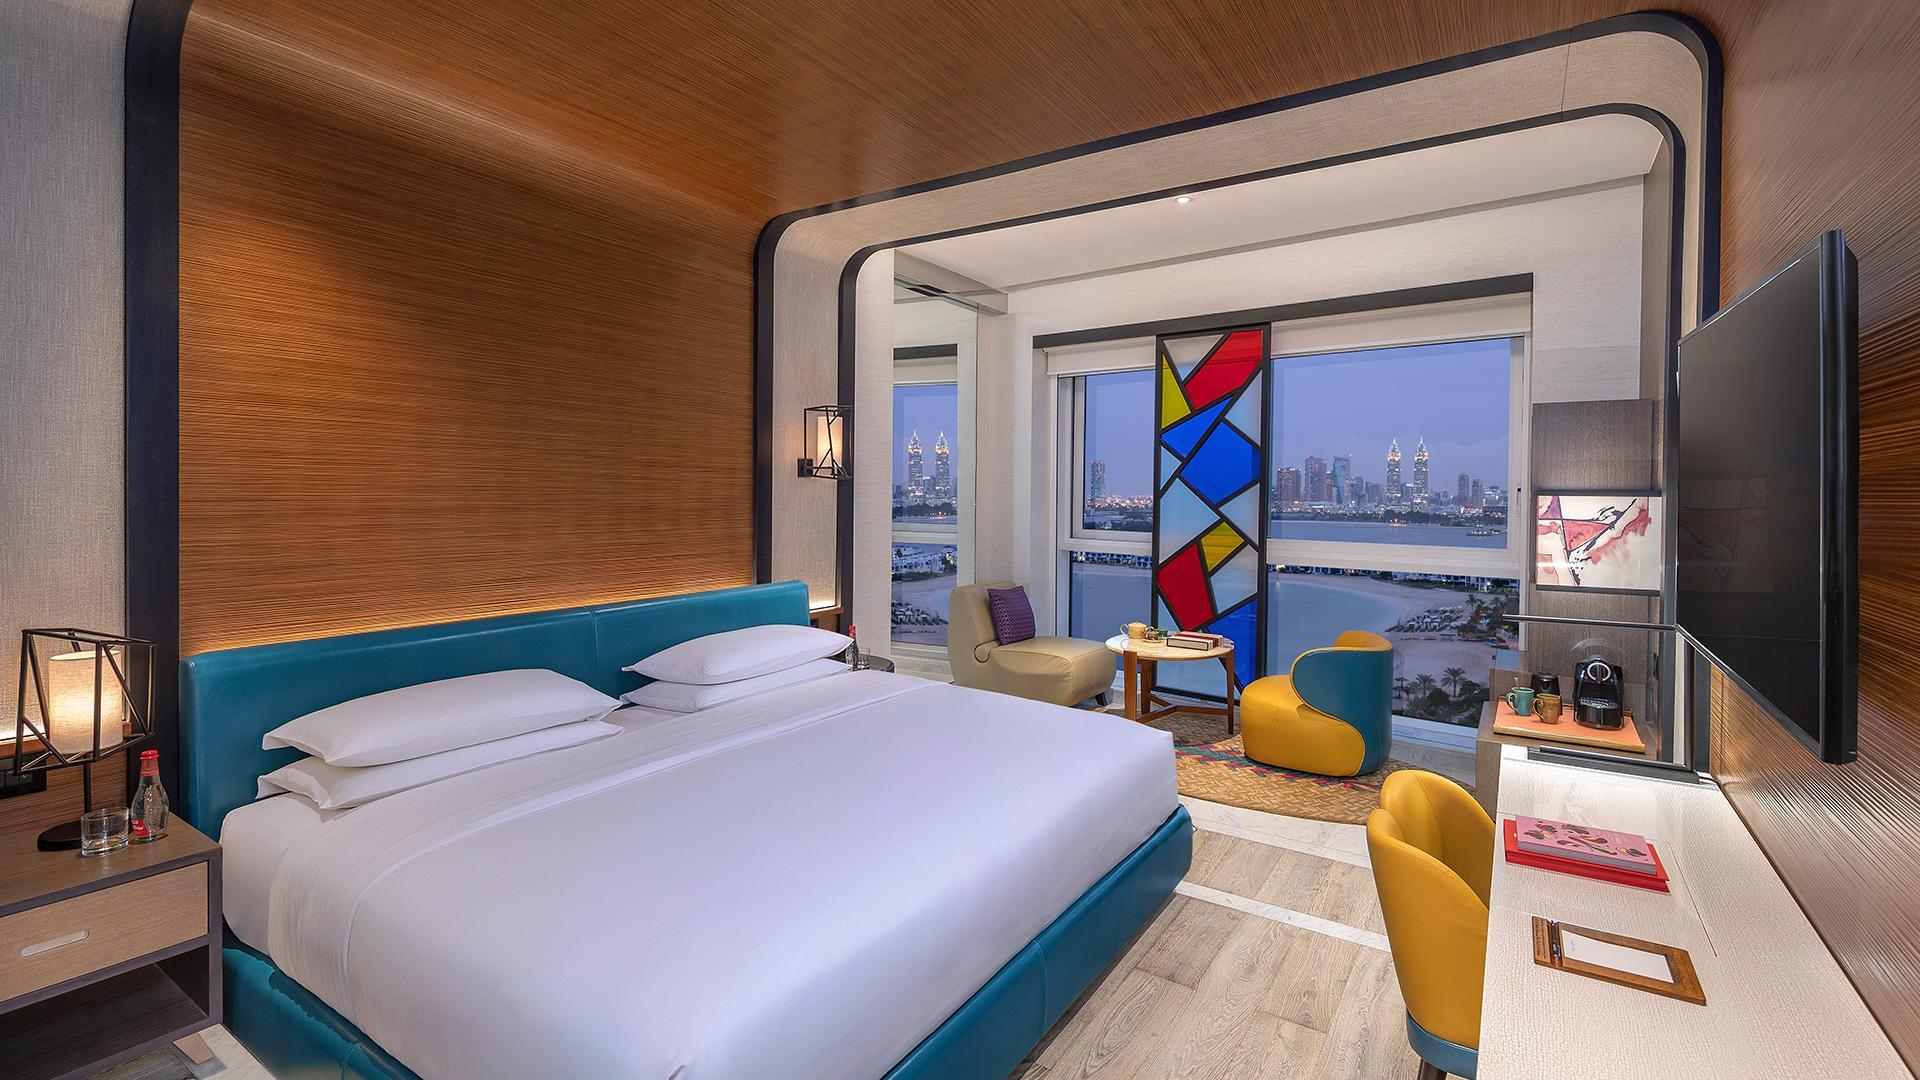 Andaz Sea-View Room  image 1 at Andaz Dubai The Palm by null, Dubai, United Arab Emirates